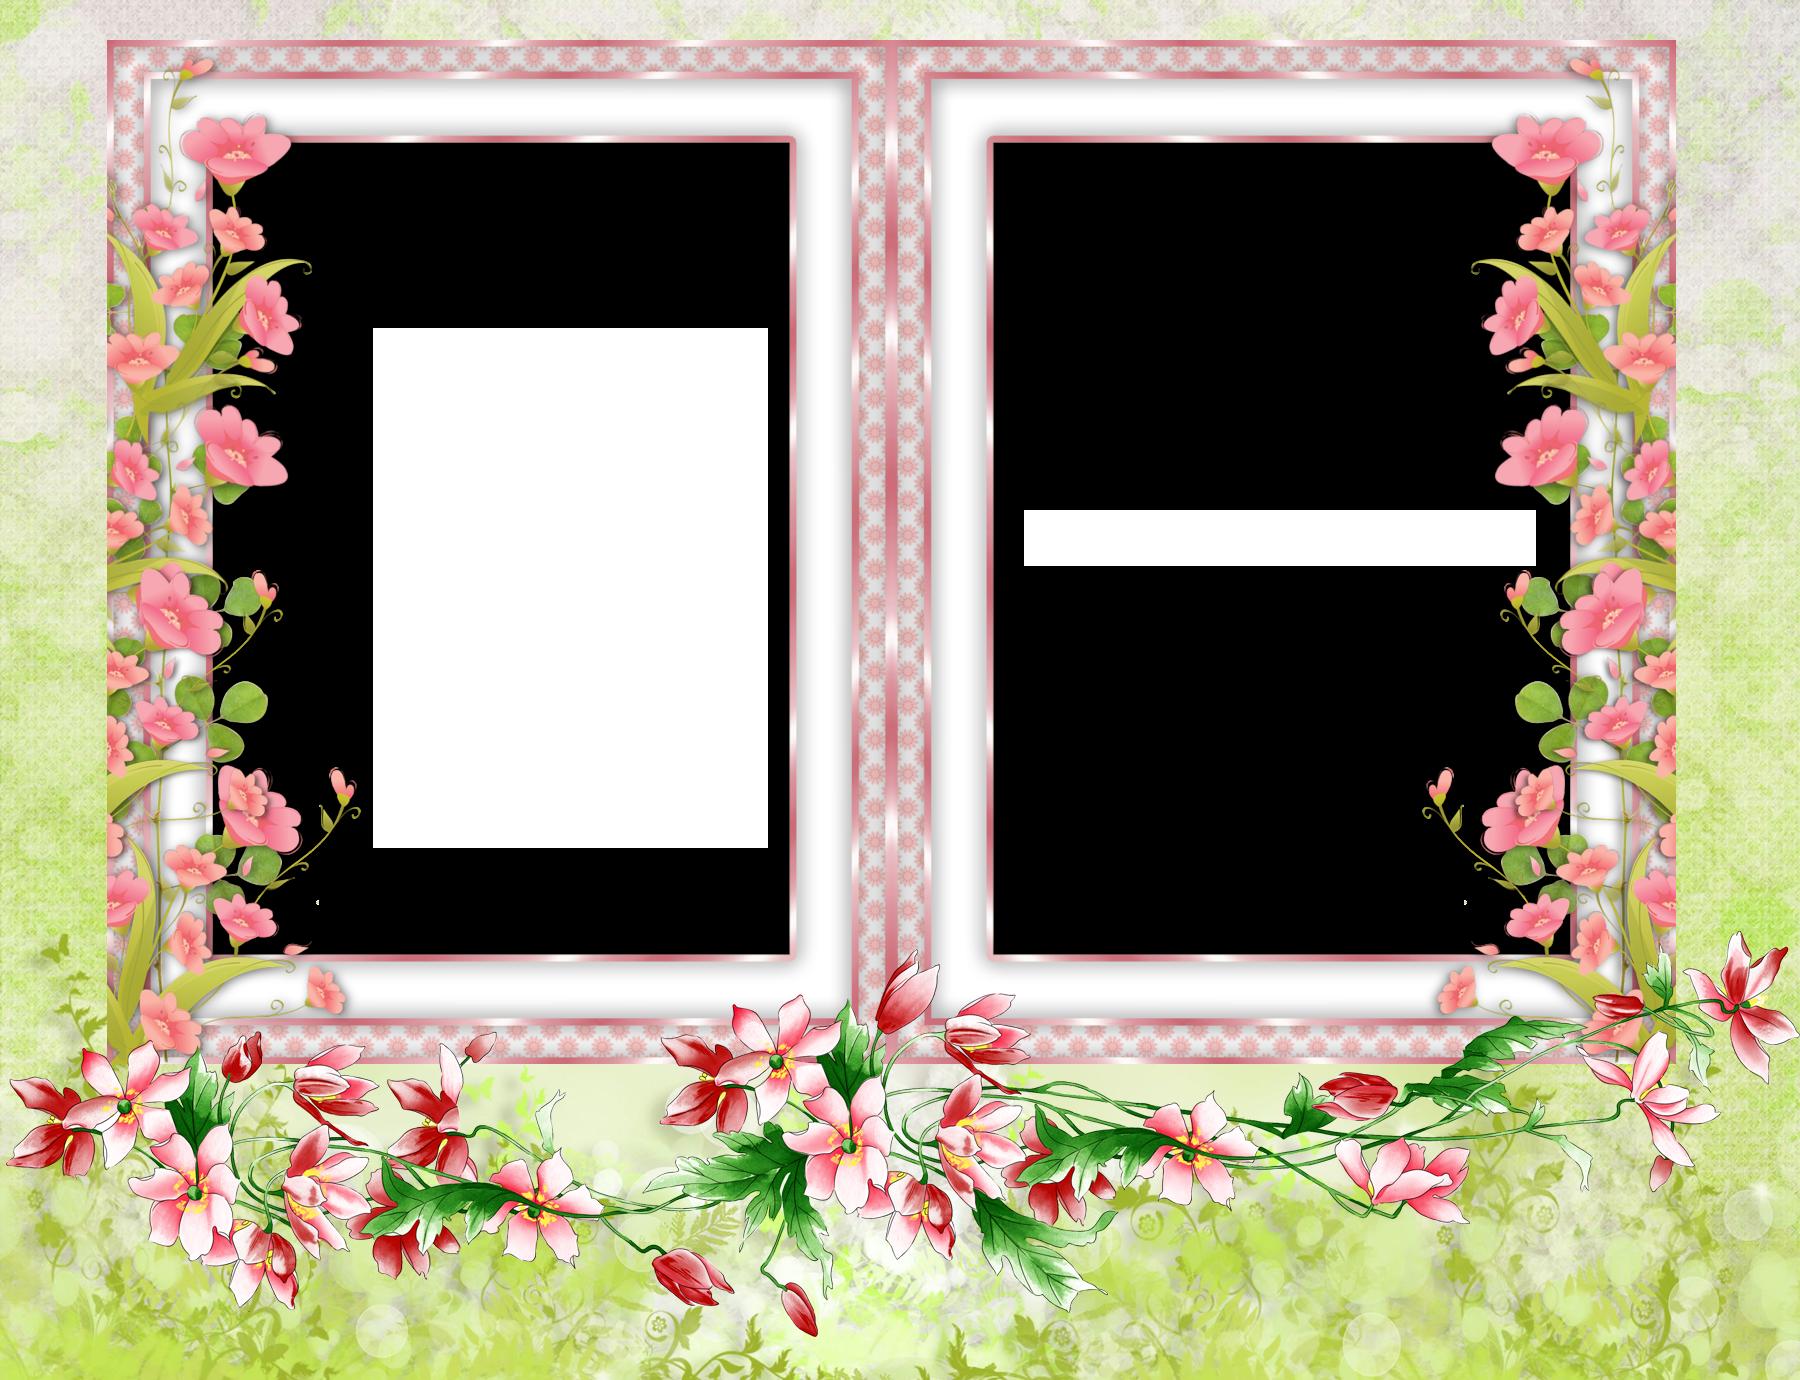 Рамка для одной фото фотопленка онлайн